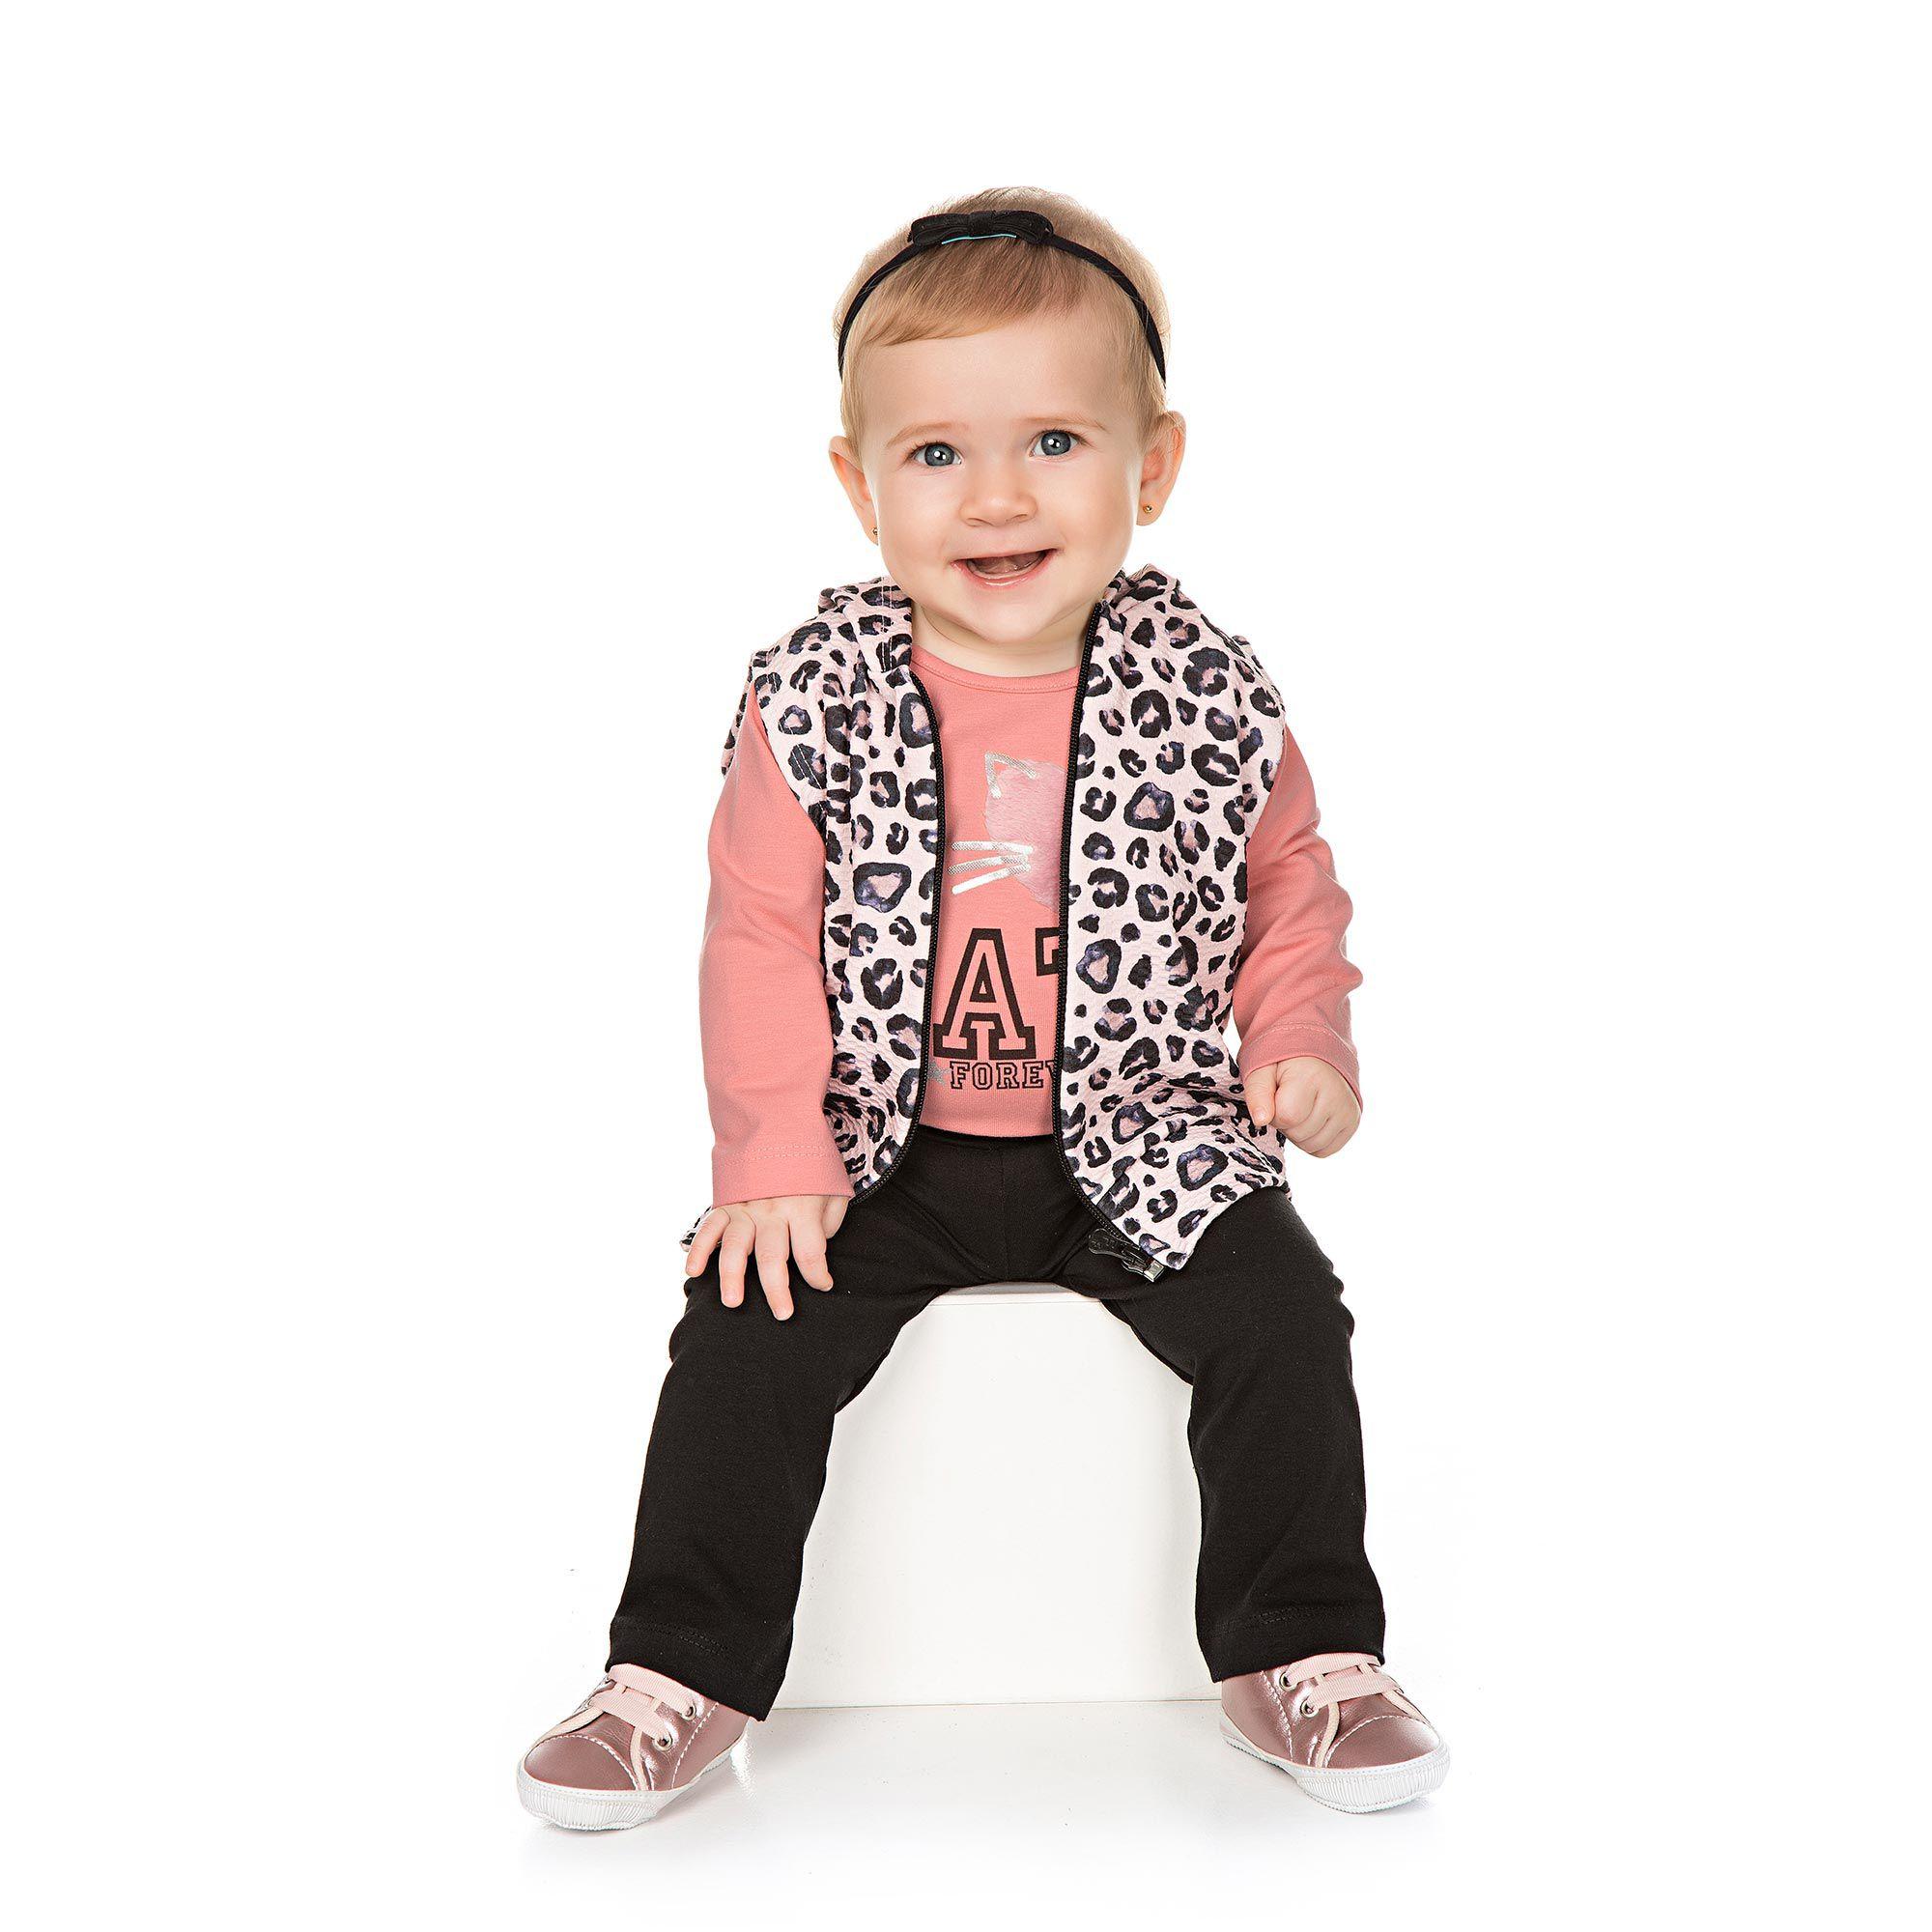 Conjunto Infantil para Bebê 3 peças - Ref 4935 - Tutti Frutti/ME01